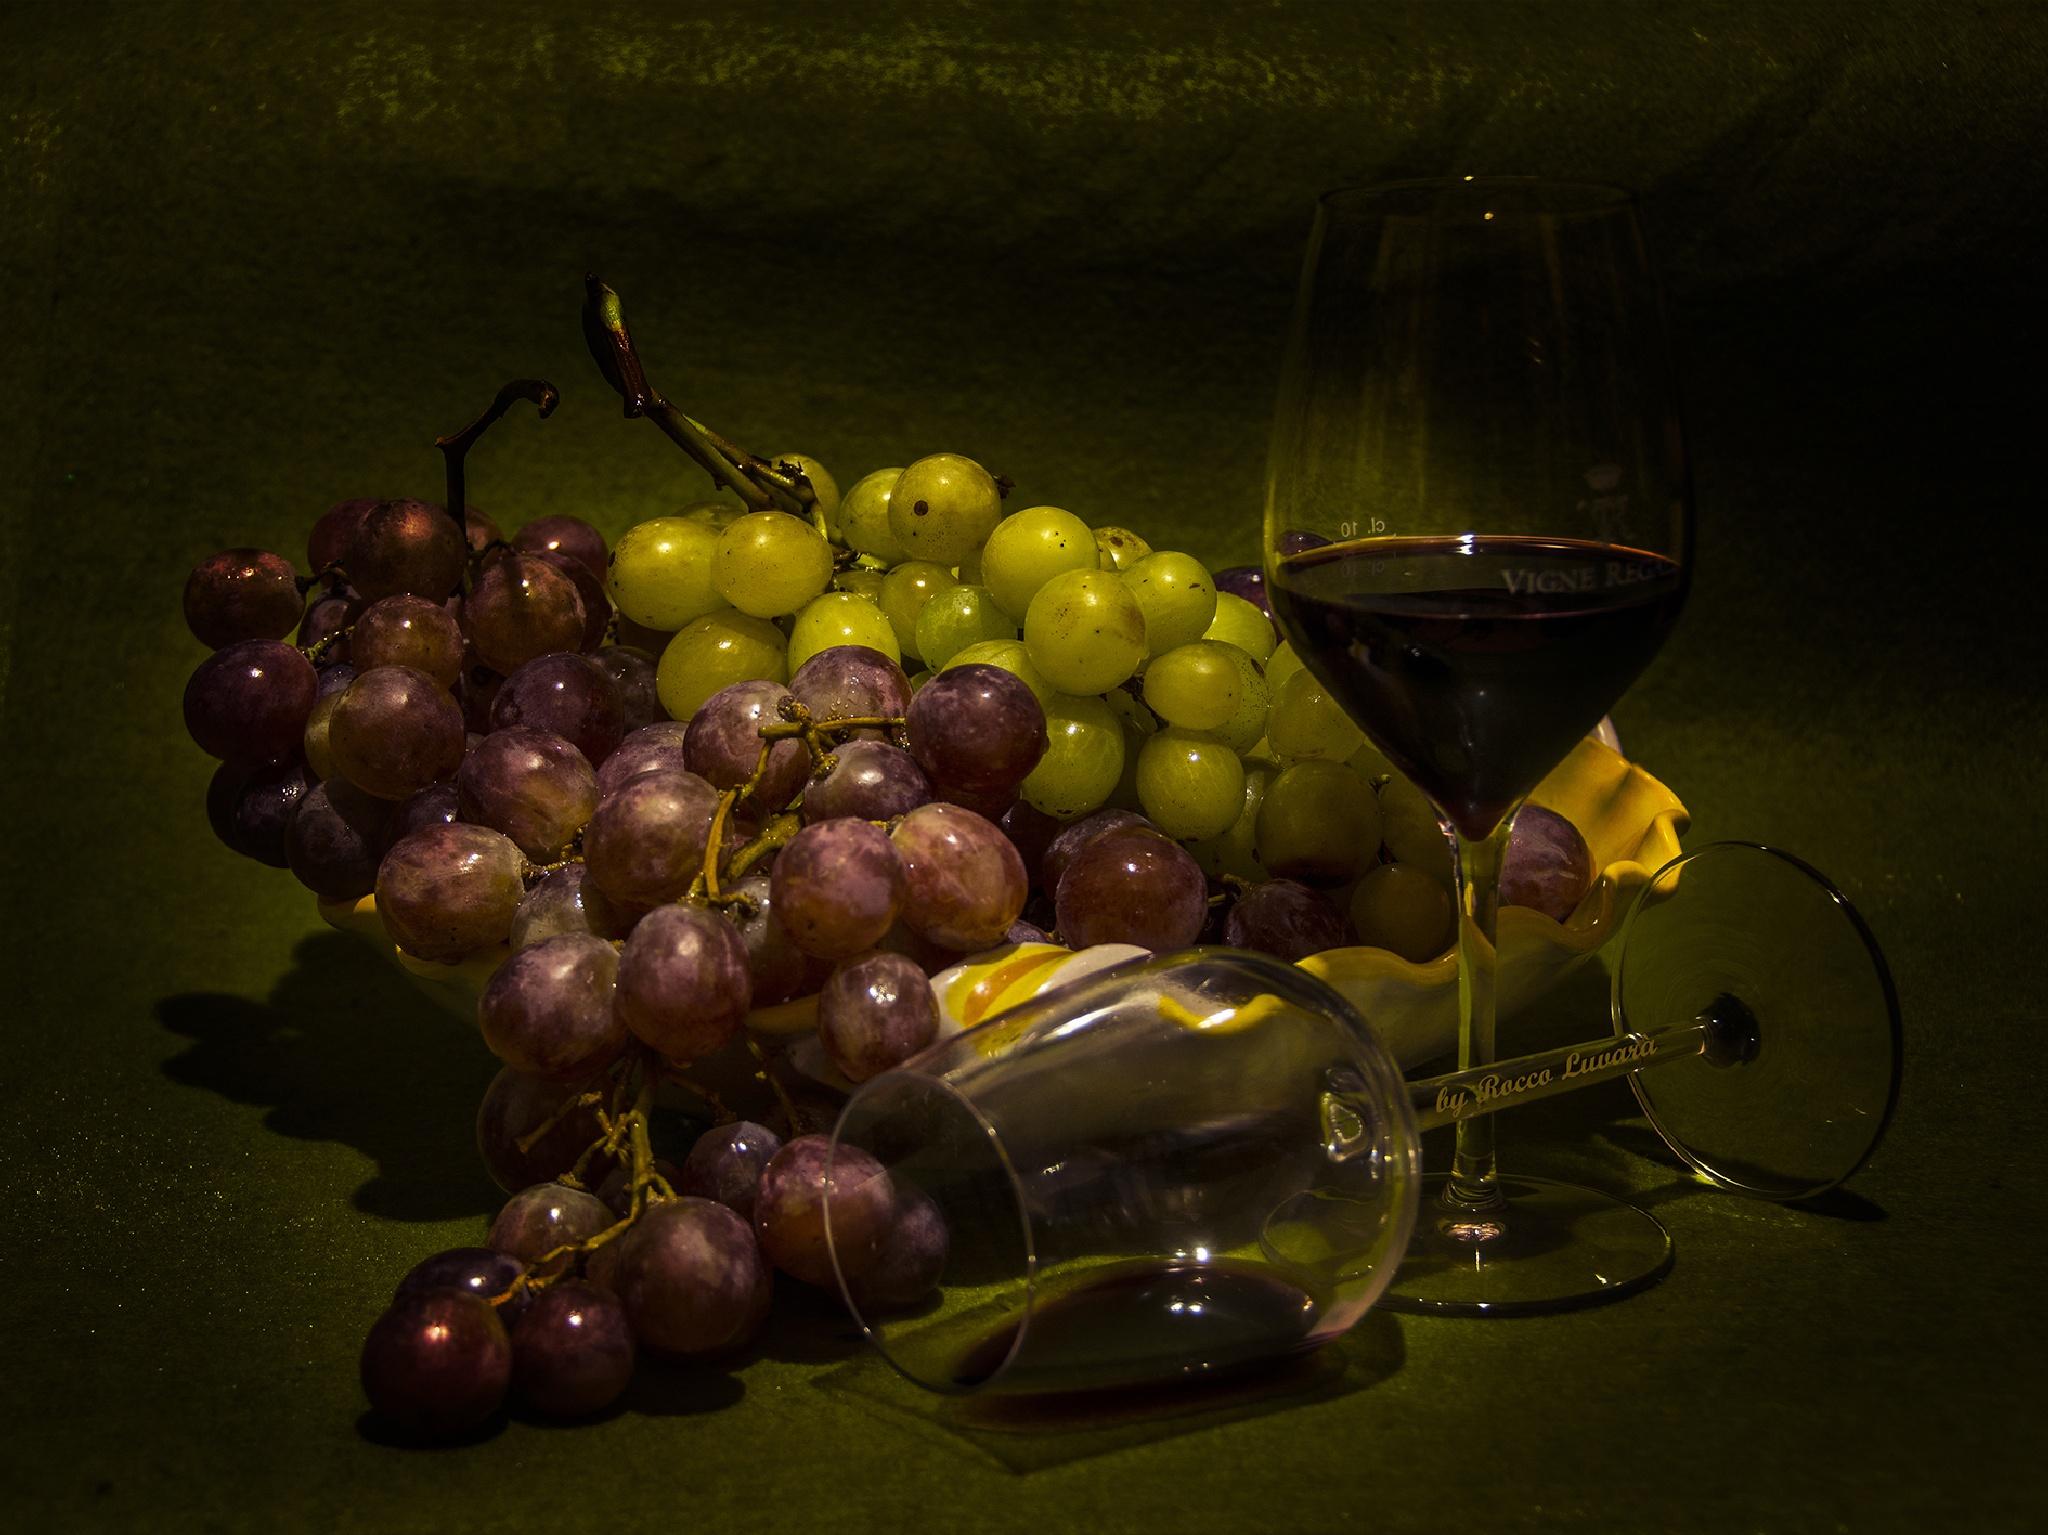 Untitled by Luvarà Rocco